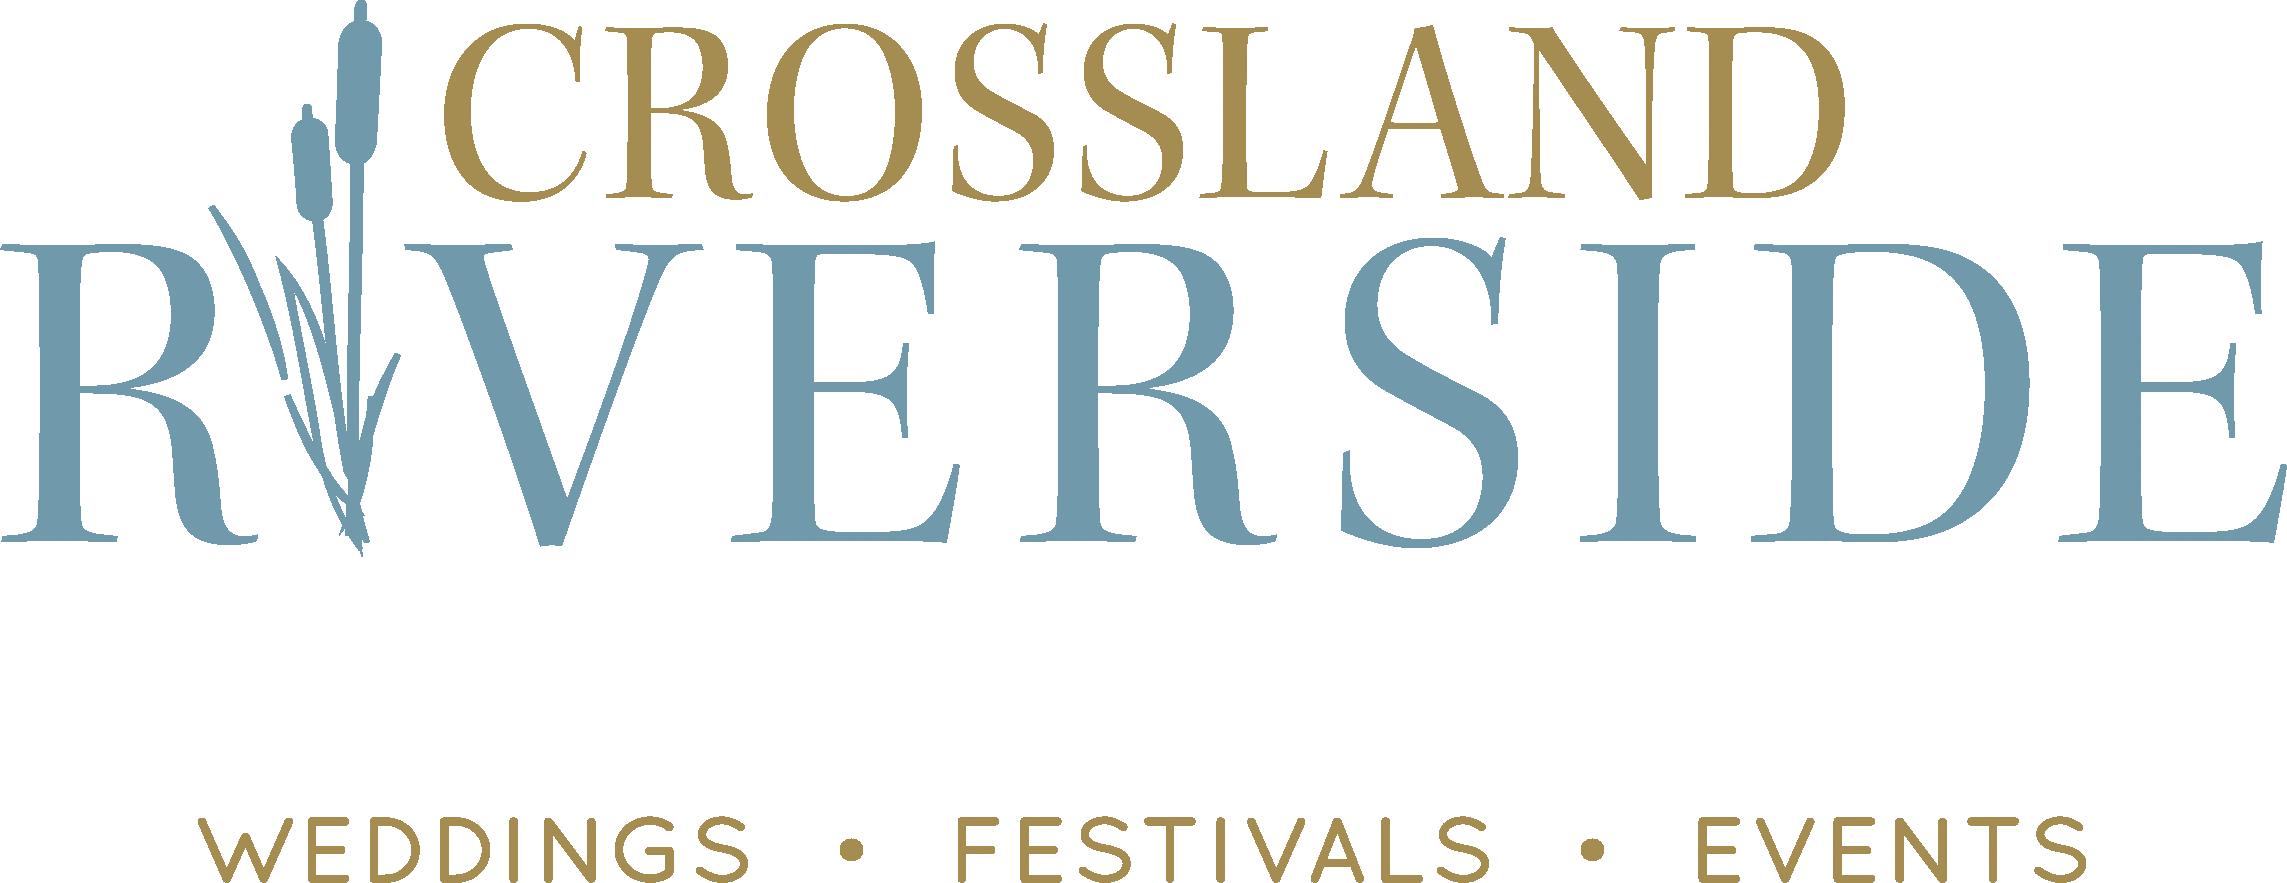 Crossland Riverside Logo